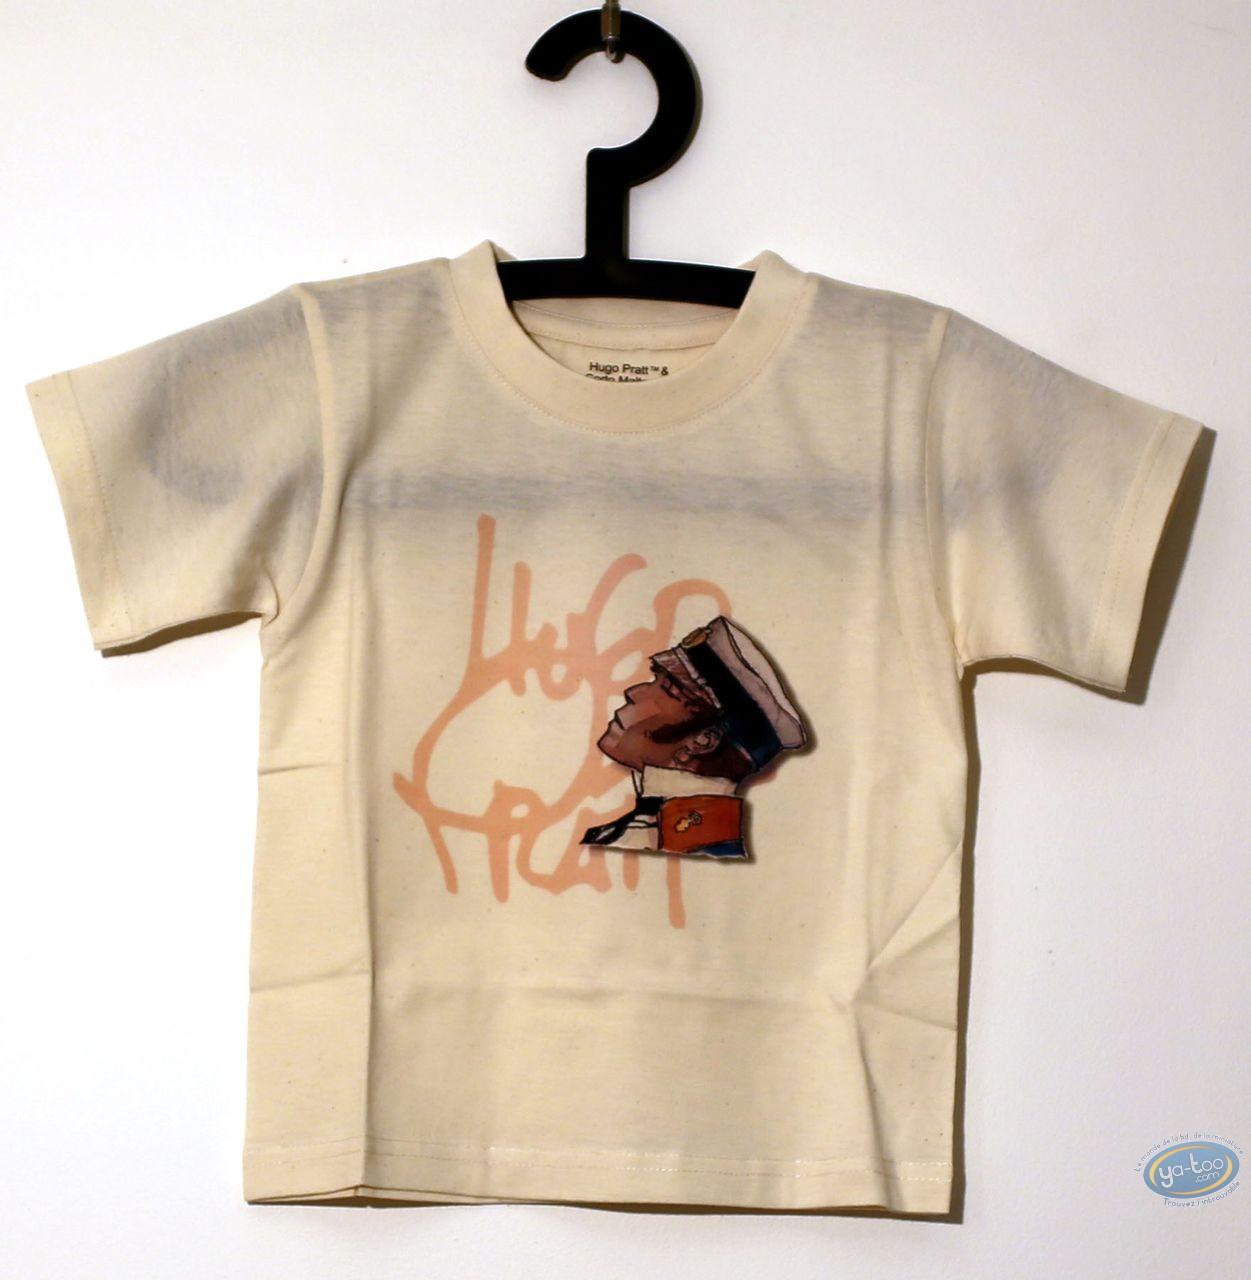 Clothes, Corto Maltese : T-shirt, Corto Maltese : Kid 02/02 - 3/4 years